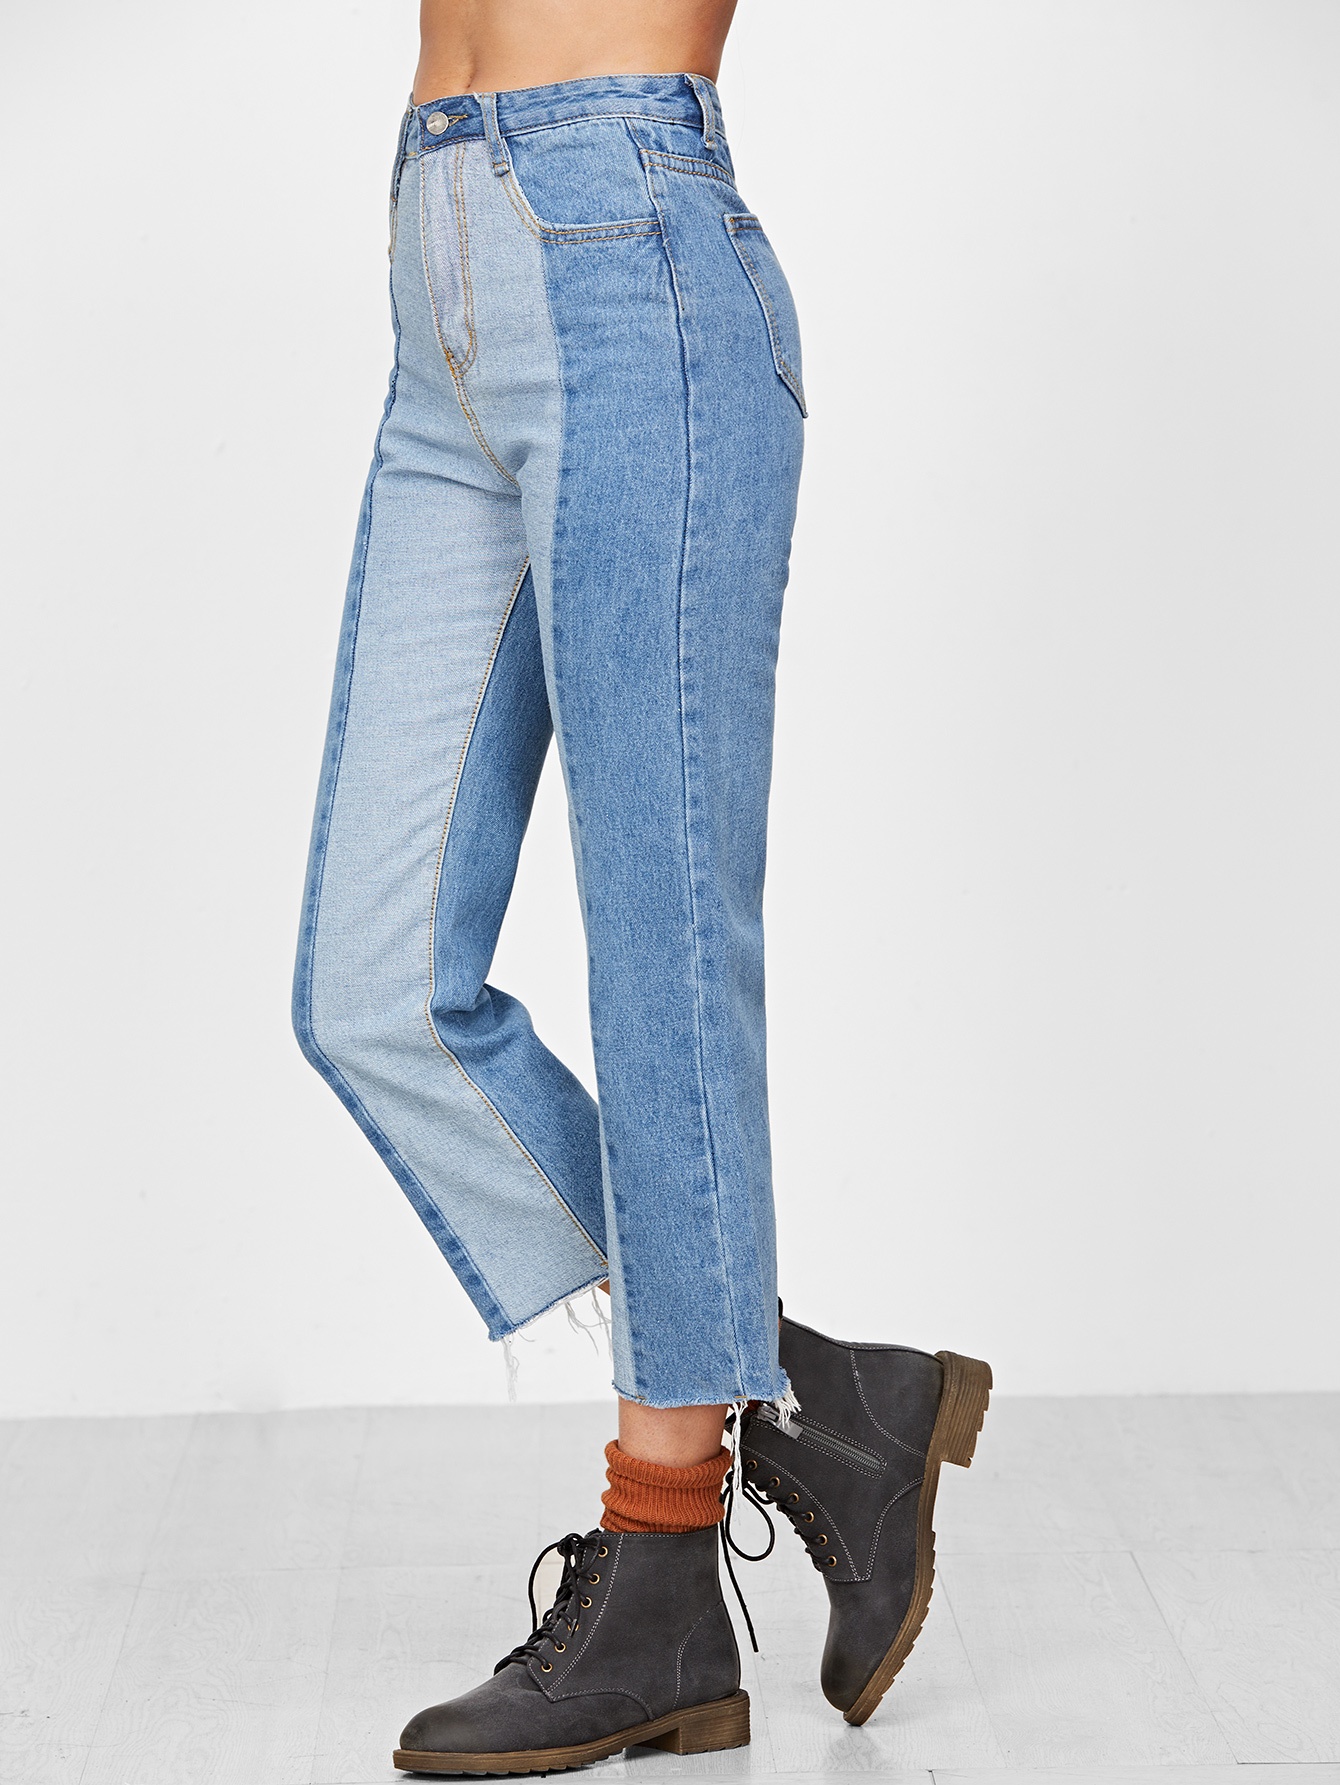 00f89a4644 Blue Contrast Raw Hem Straight Jeans -SheIn(Sheinside)